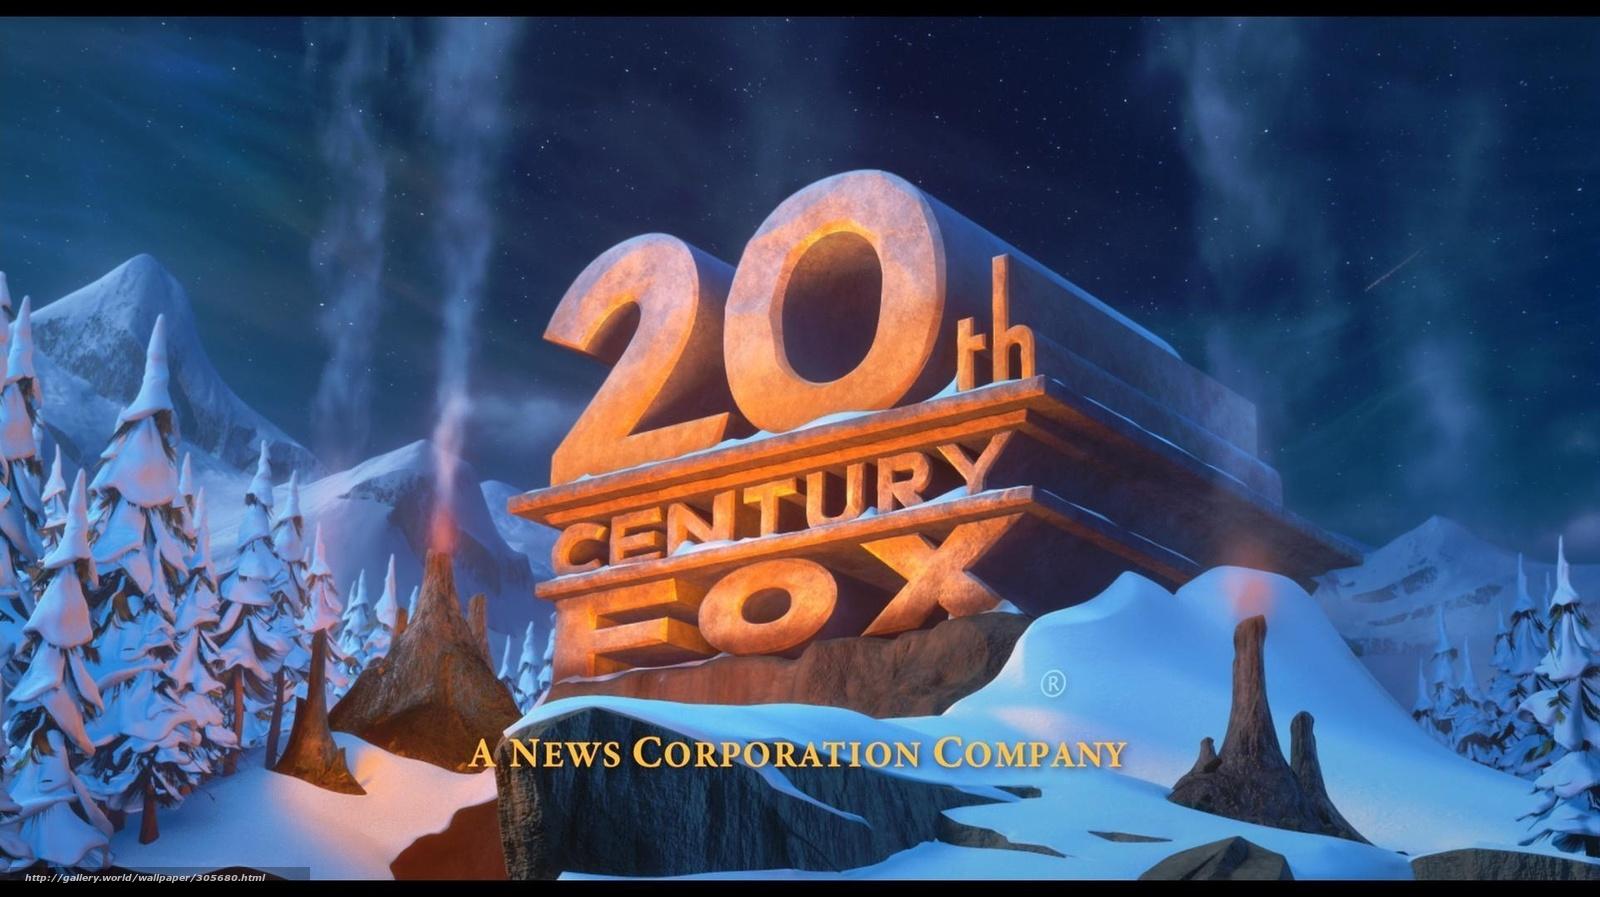 Download wallpapers 20th century fox, Film, logo, snow free desktop